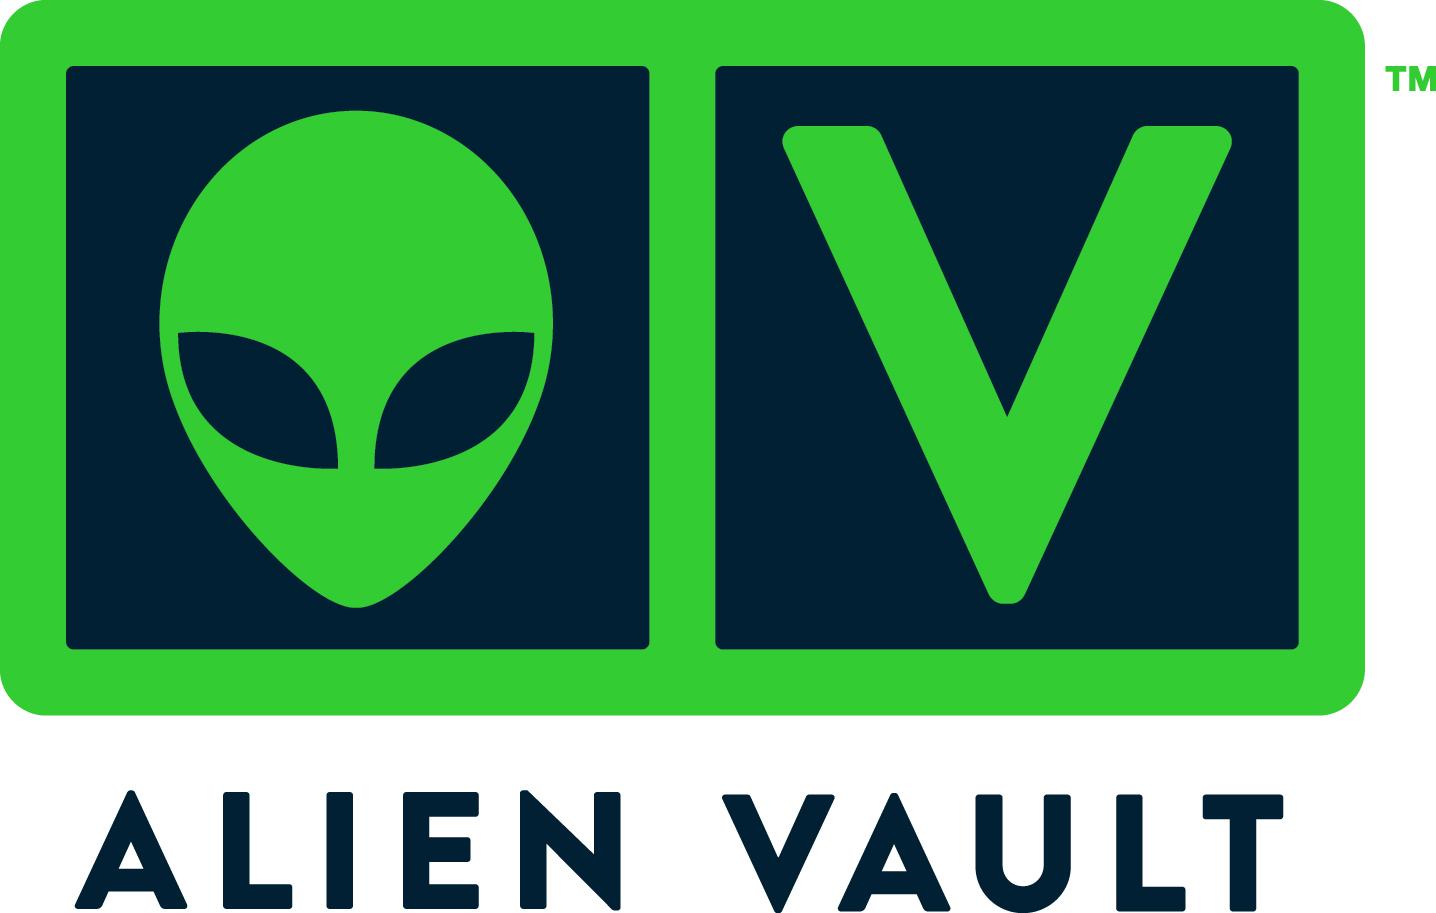 Alien Vault logo